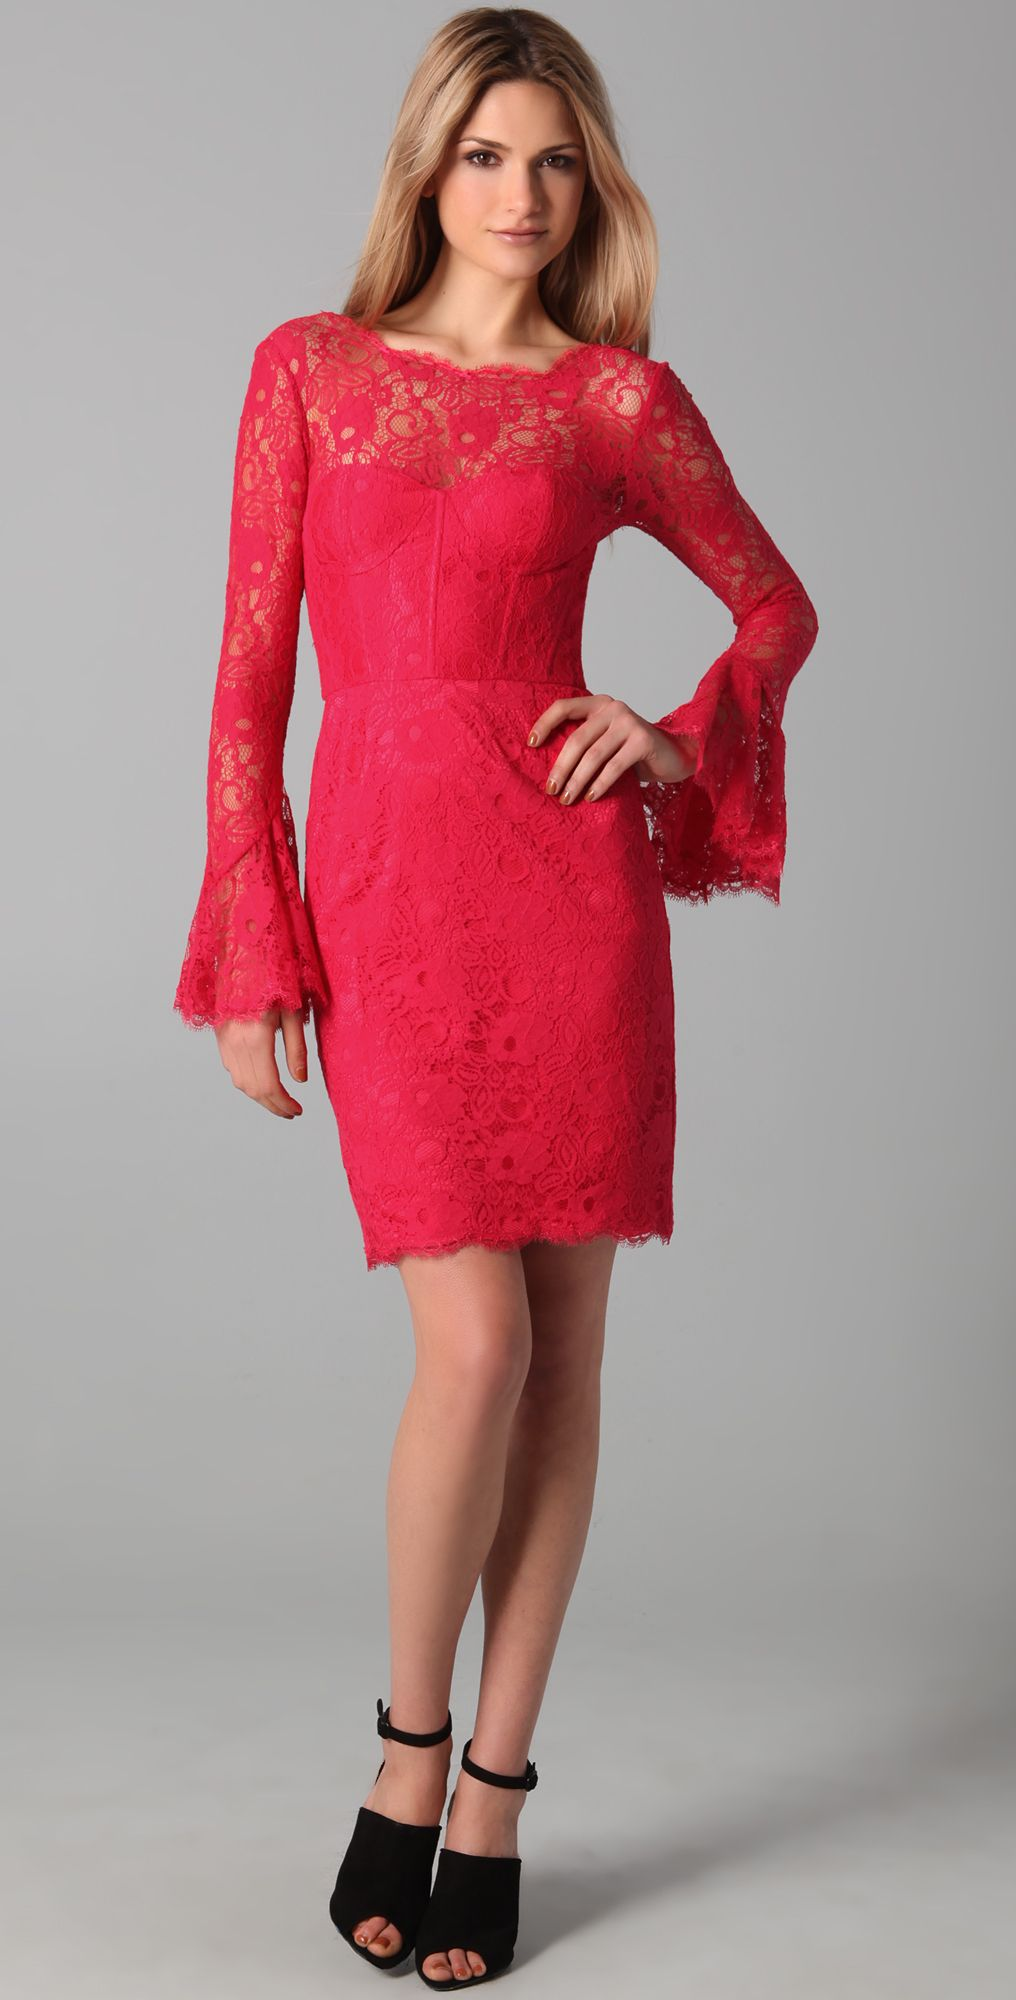 8d70387613cc BCBG Salina Red Lace Dress $298 Klänning Kjol, Mode Tips, Kläder